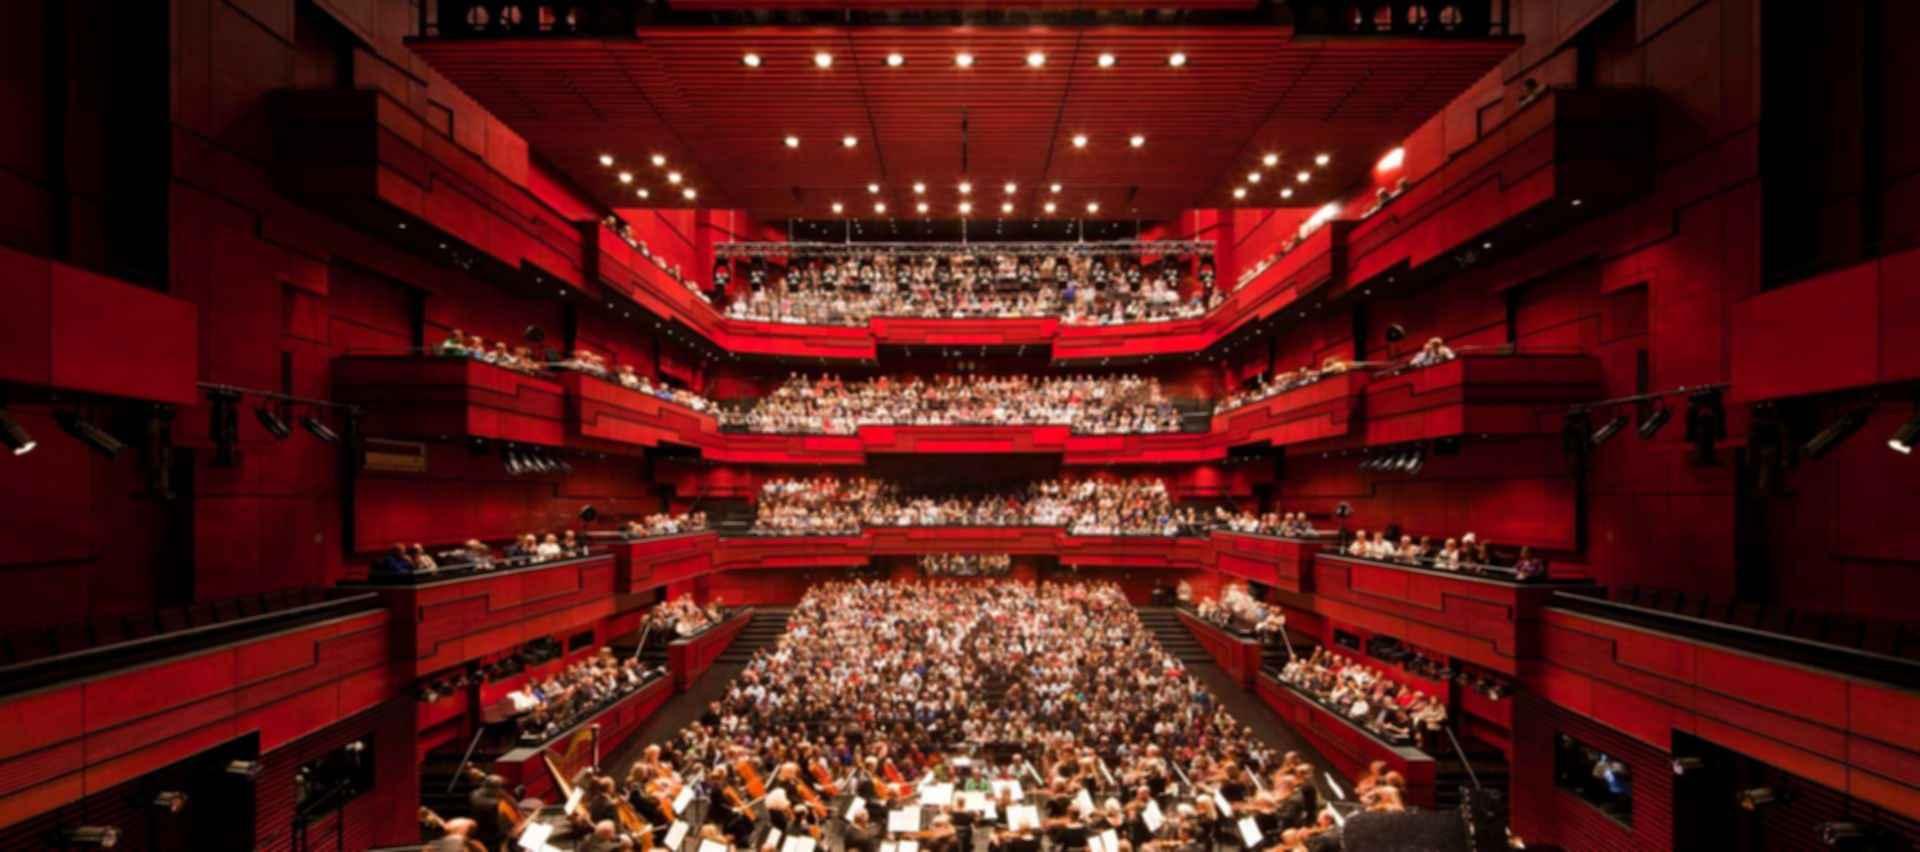 Harpa Concert Hall - Concert Hall